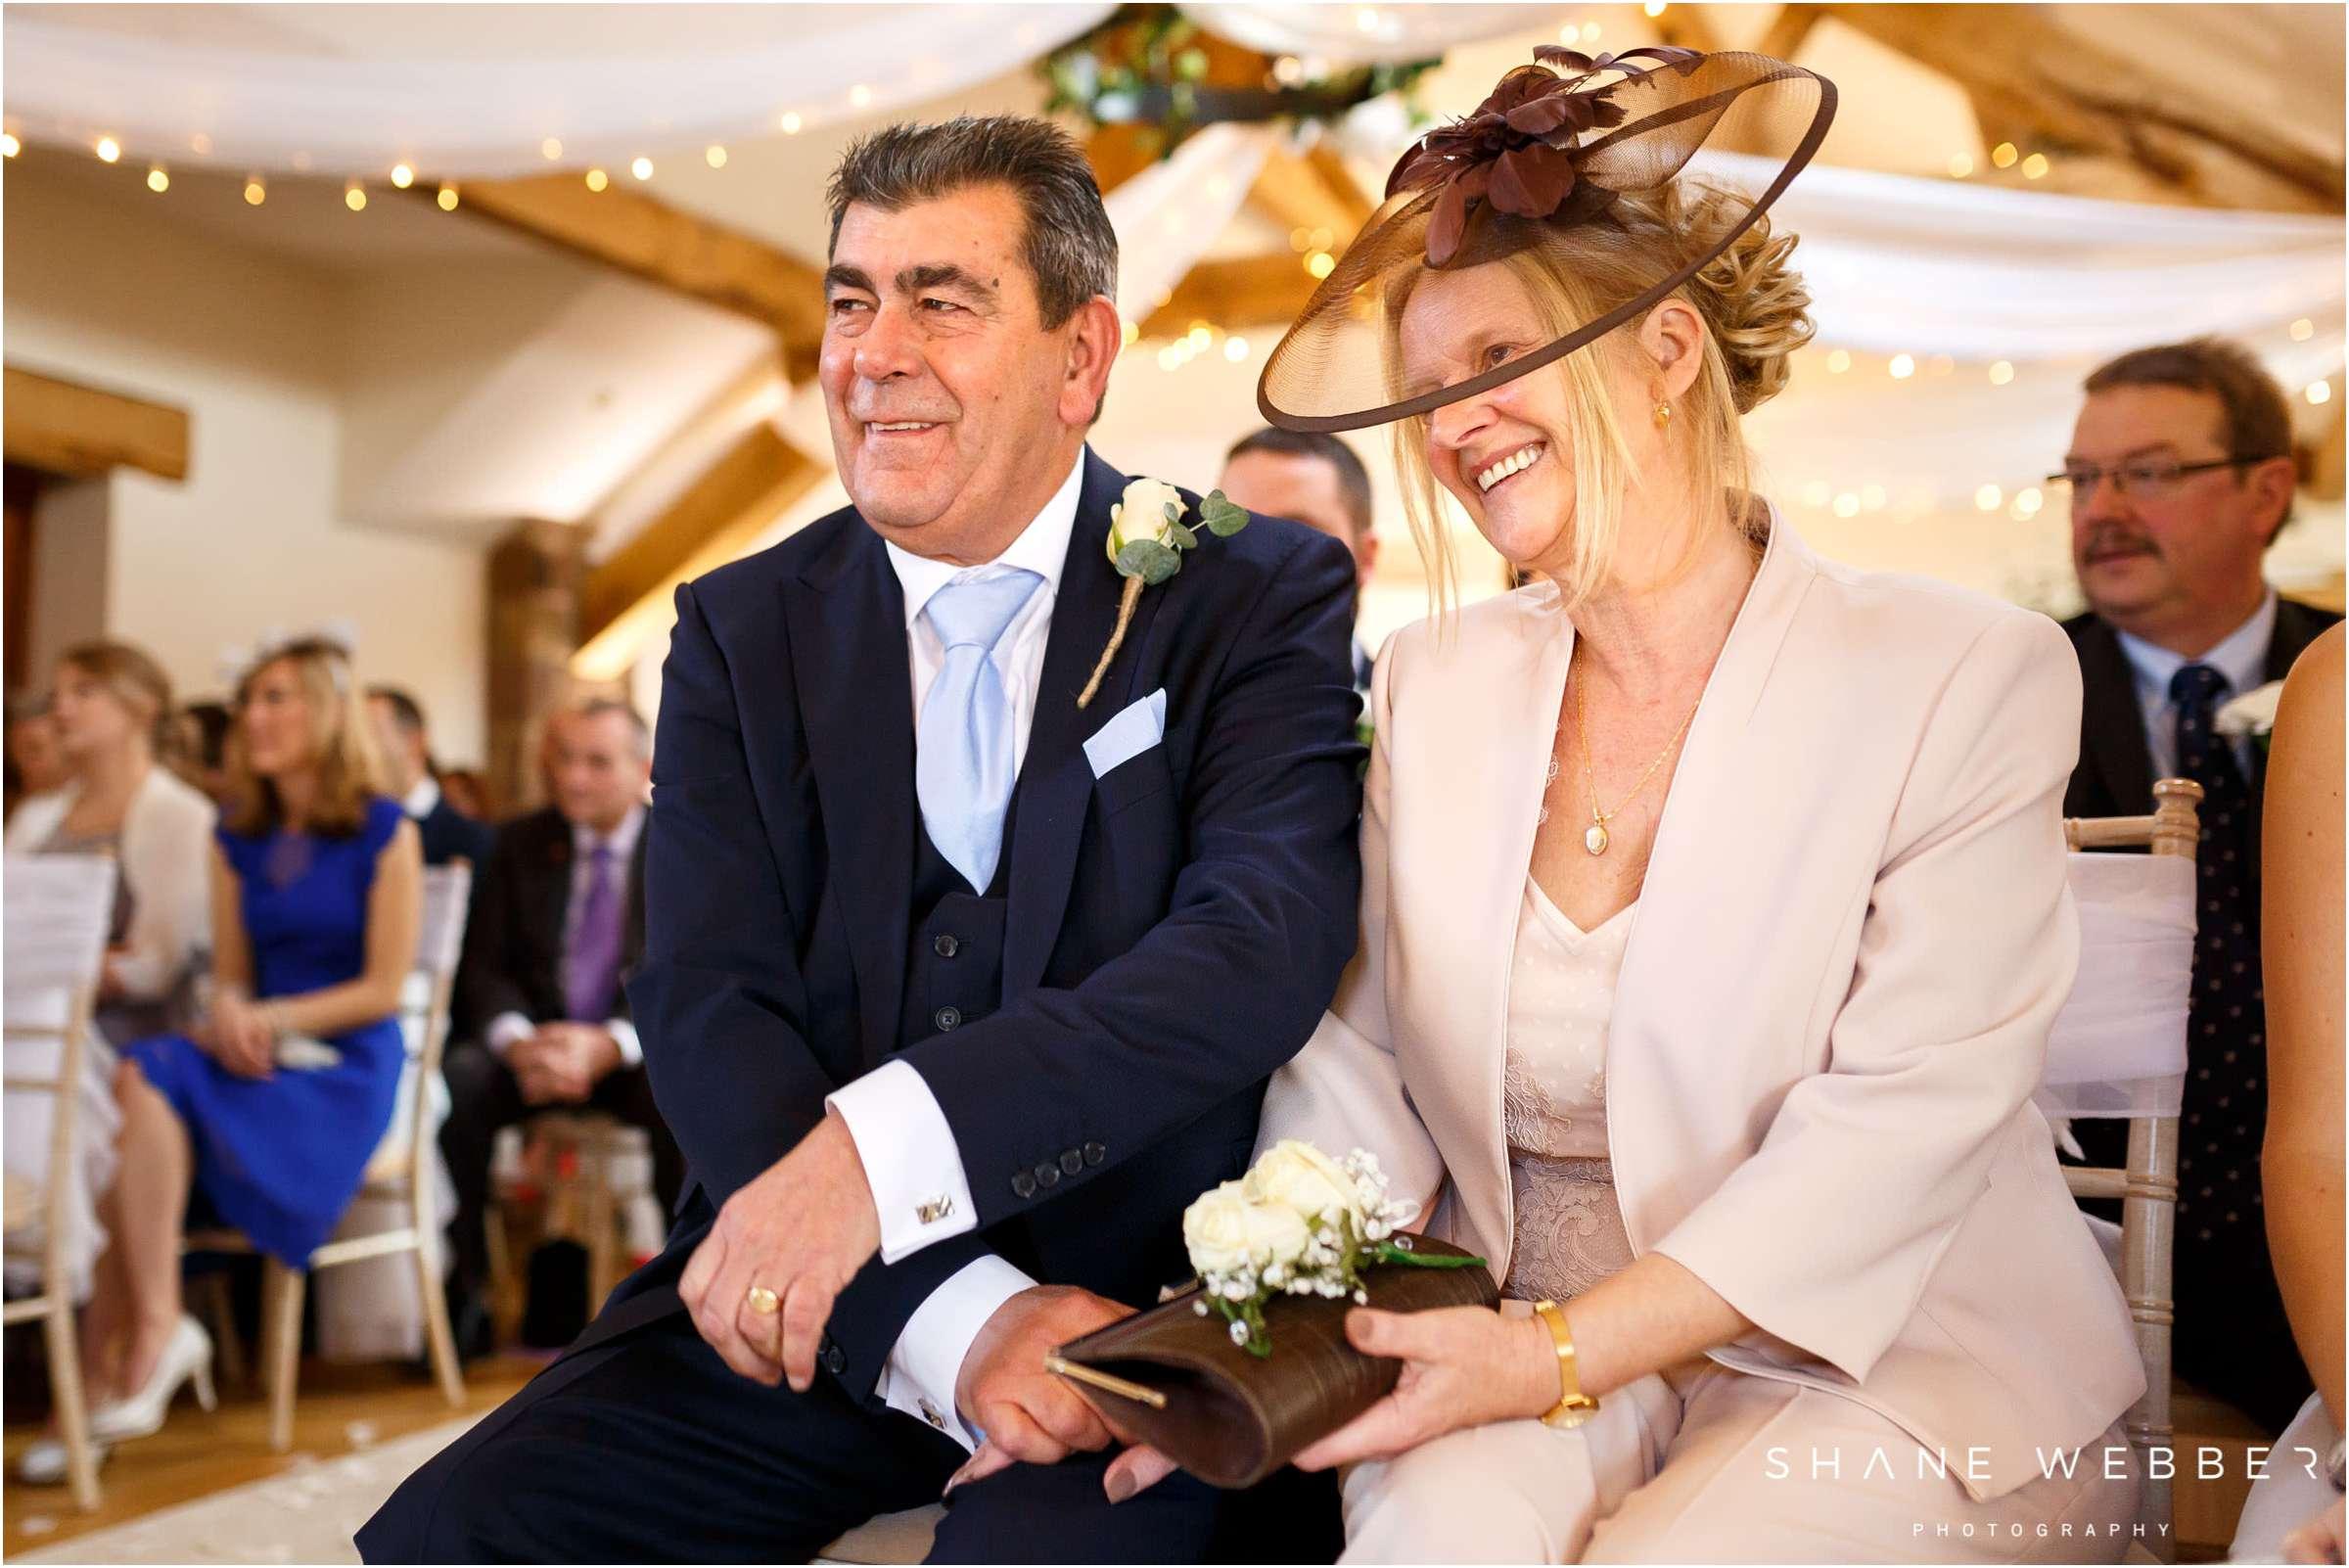 Parents of the bride wedding photo